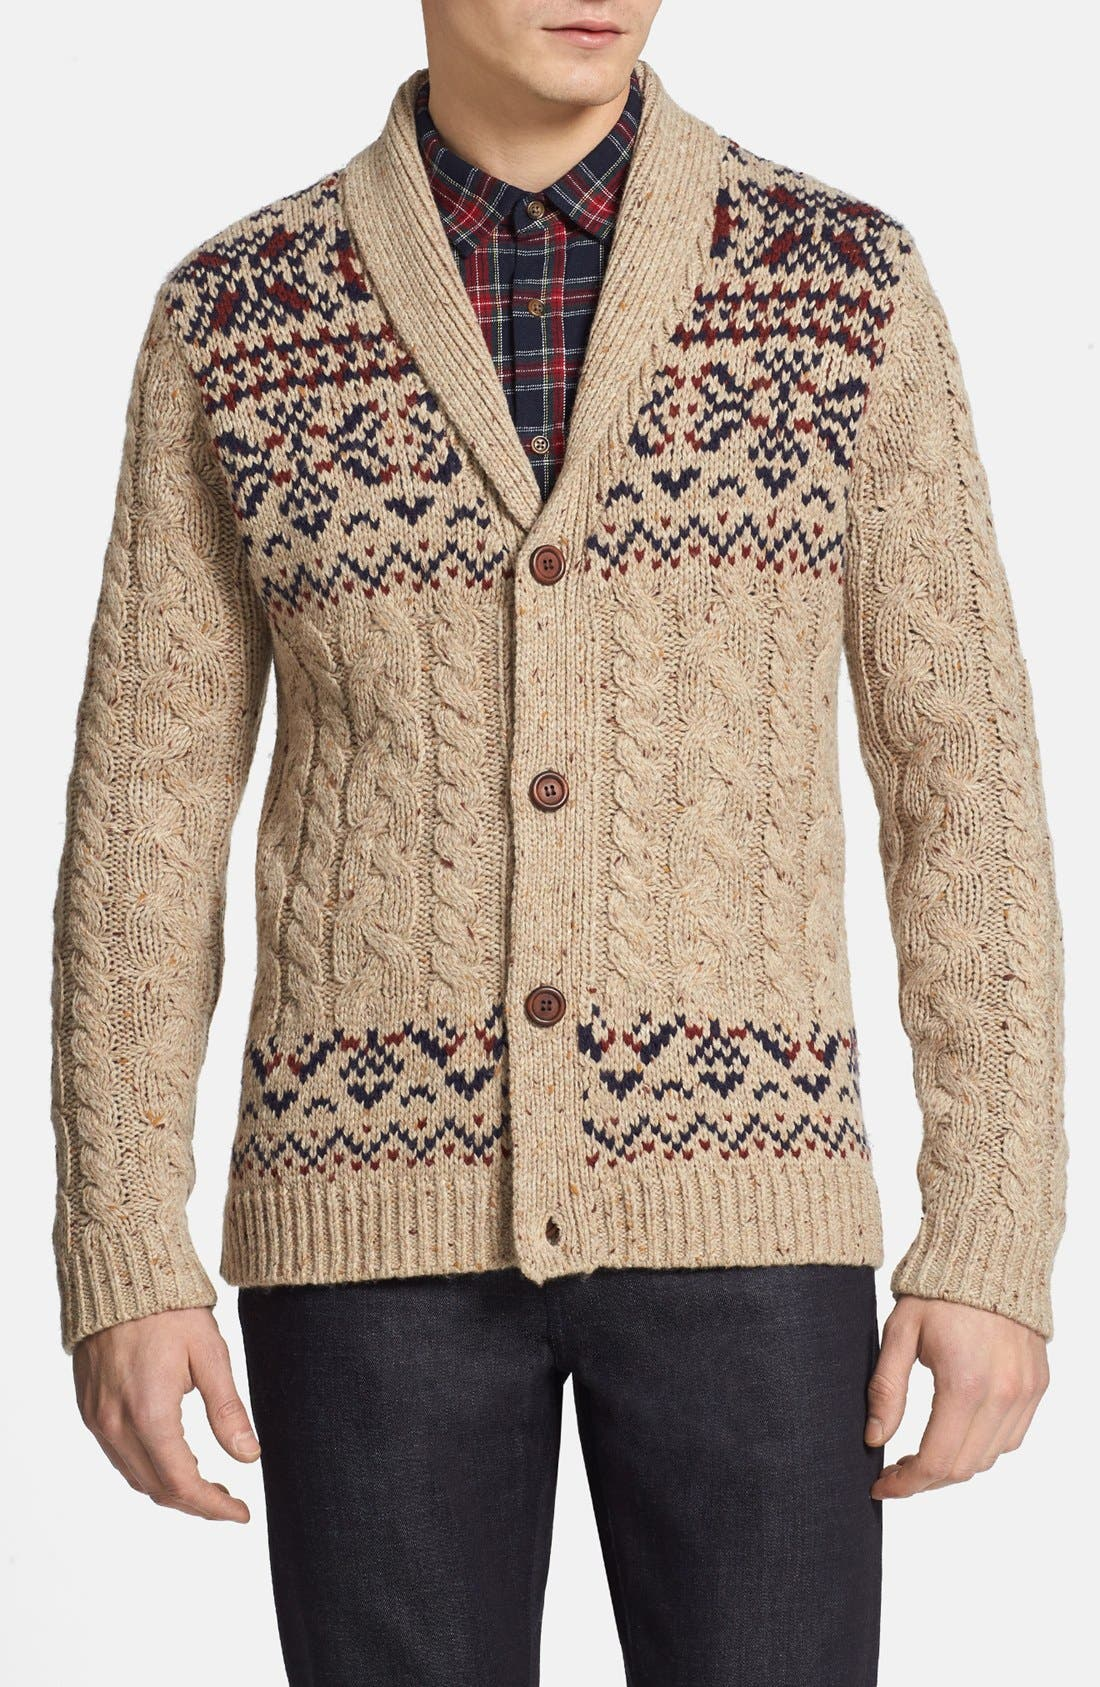 TOPMAN Oatmeal Shawl Collar Cardigan, Main, color, 250